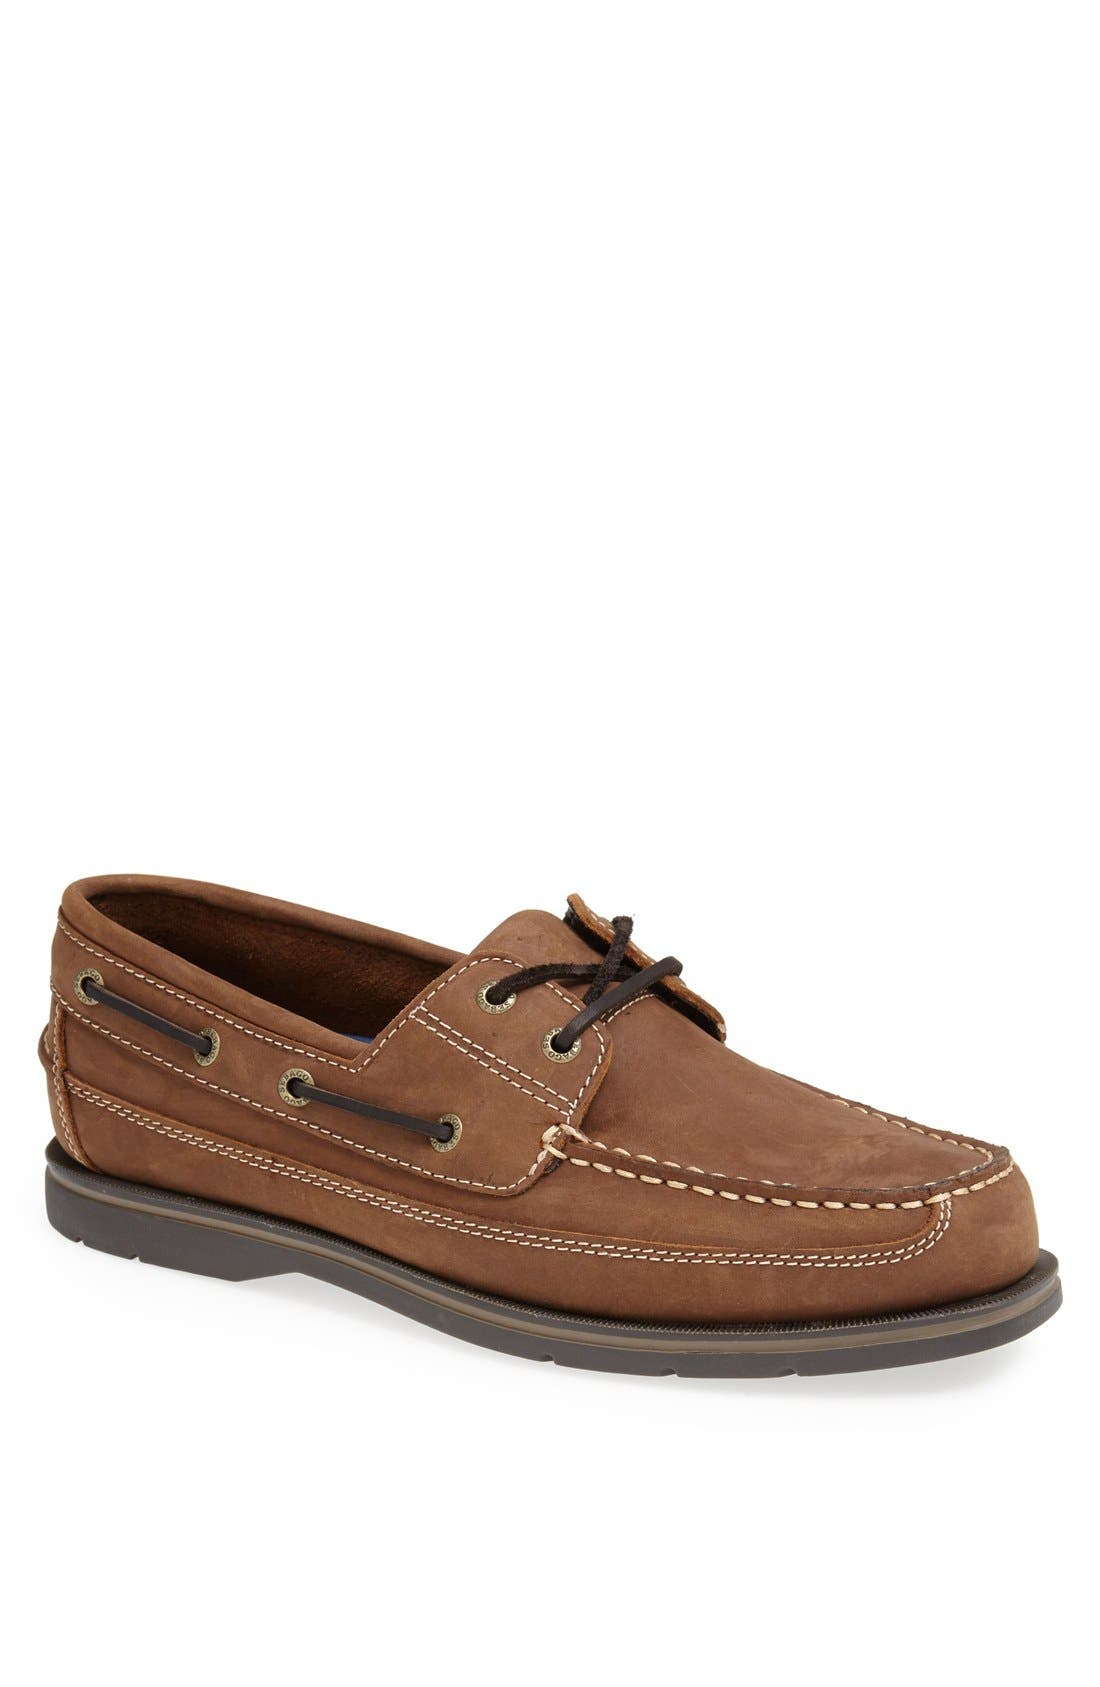 Main Image - Sebago 'Grinder' Boat Shoe